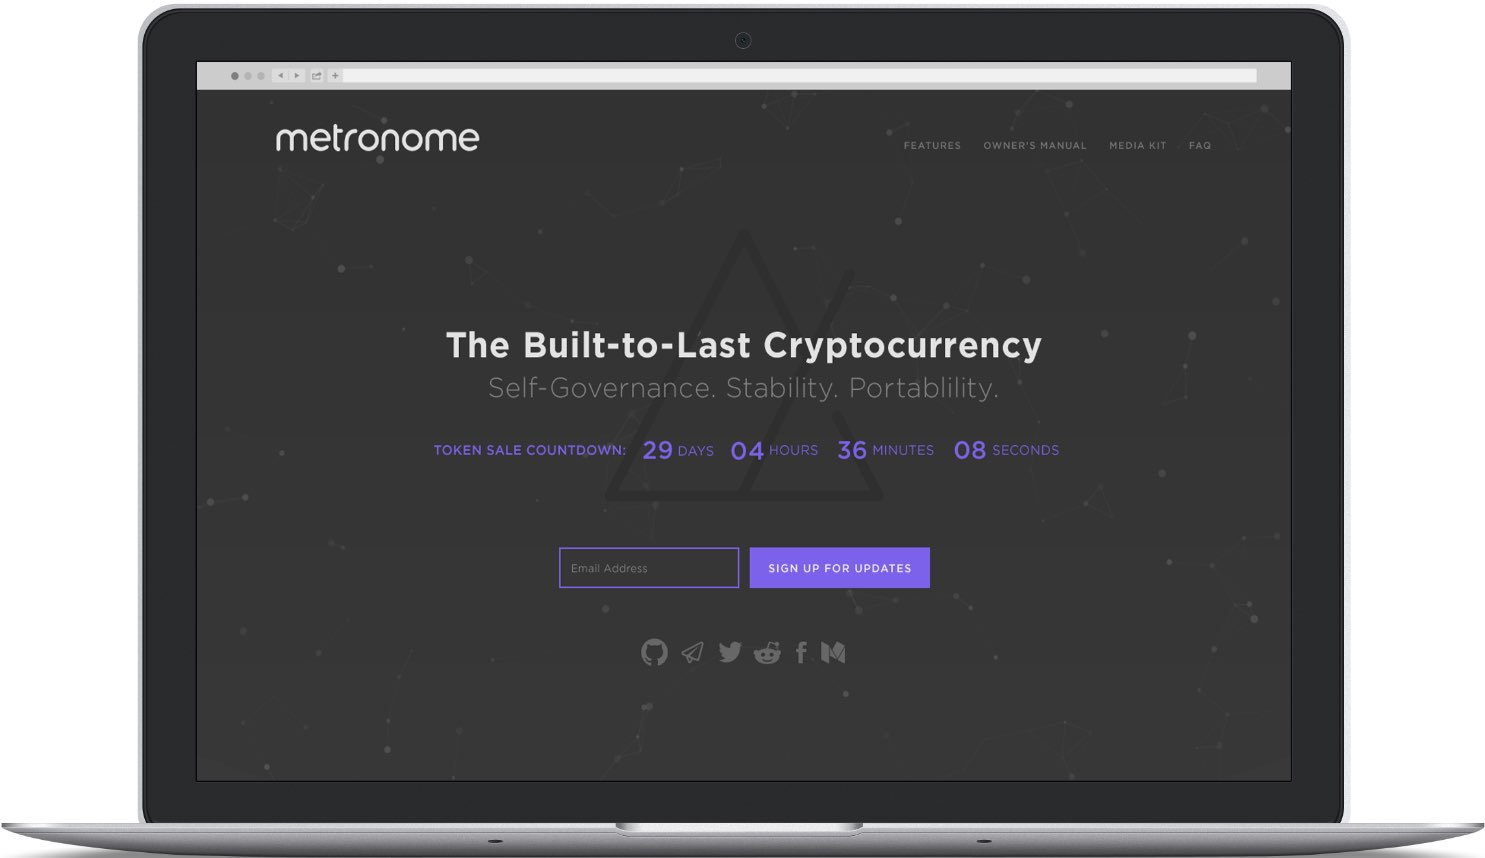 Metronome website on laptop